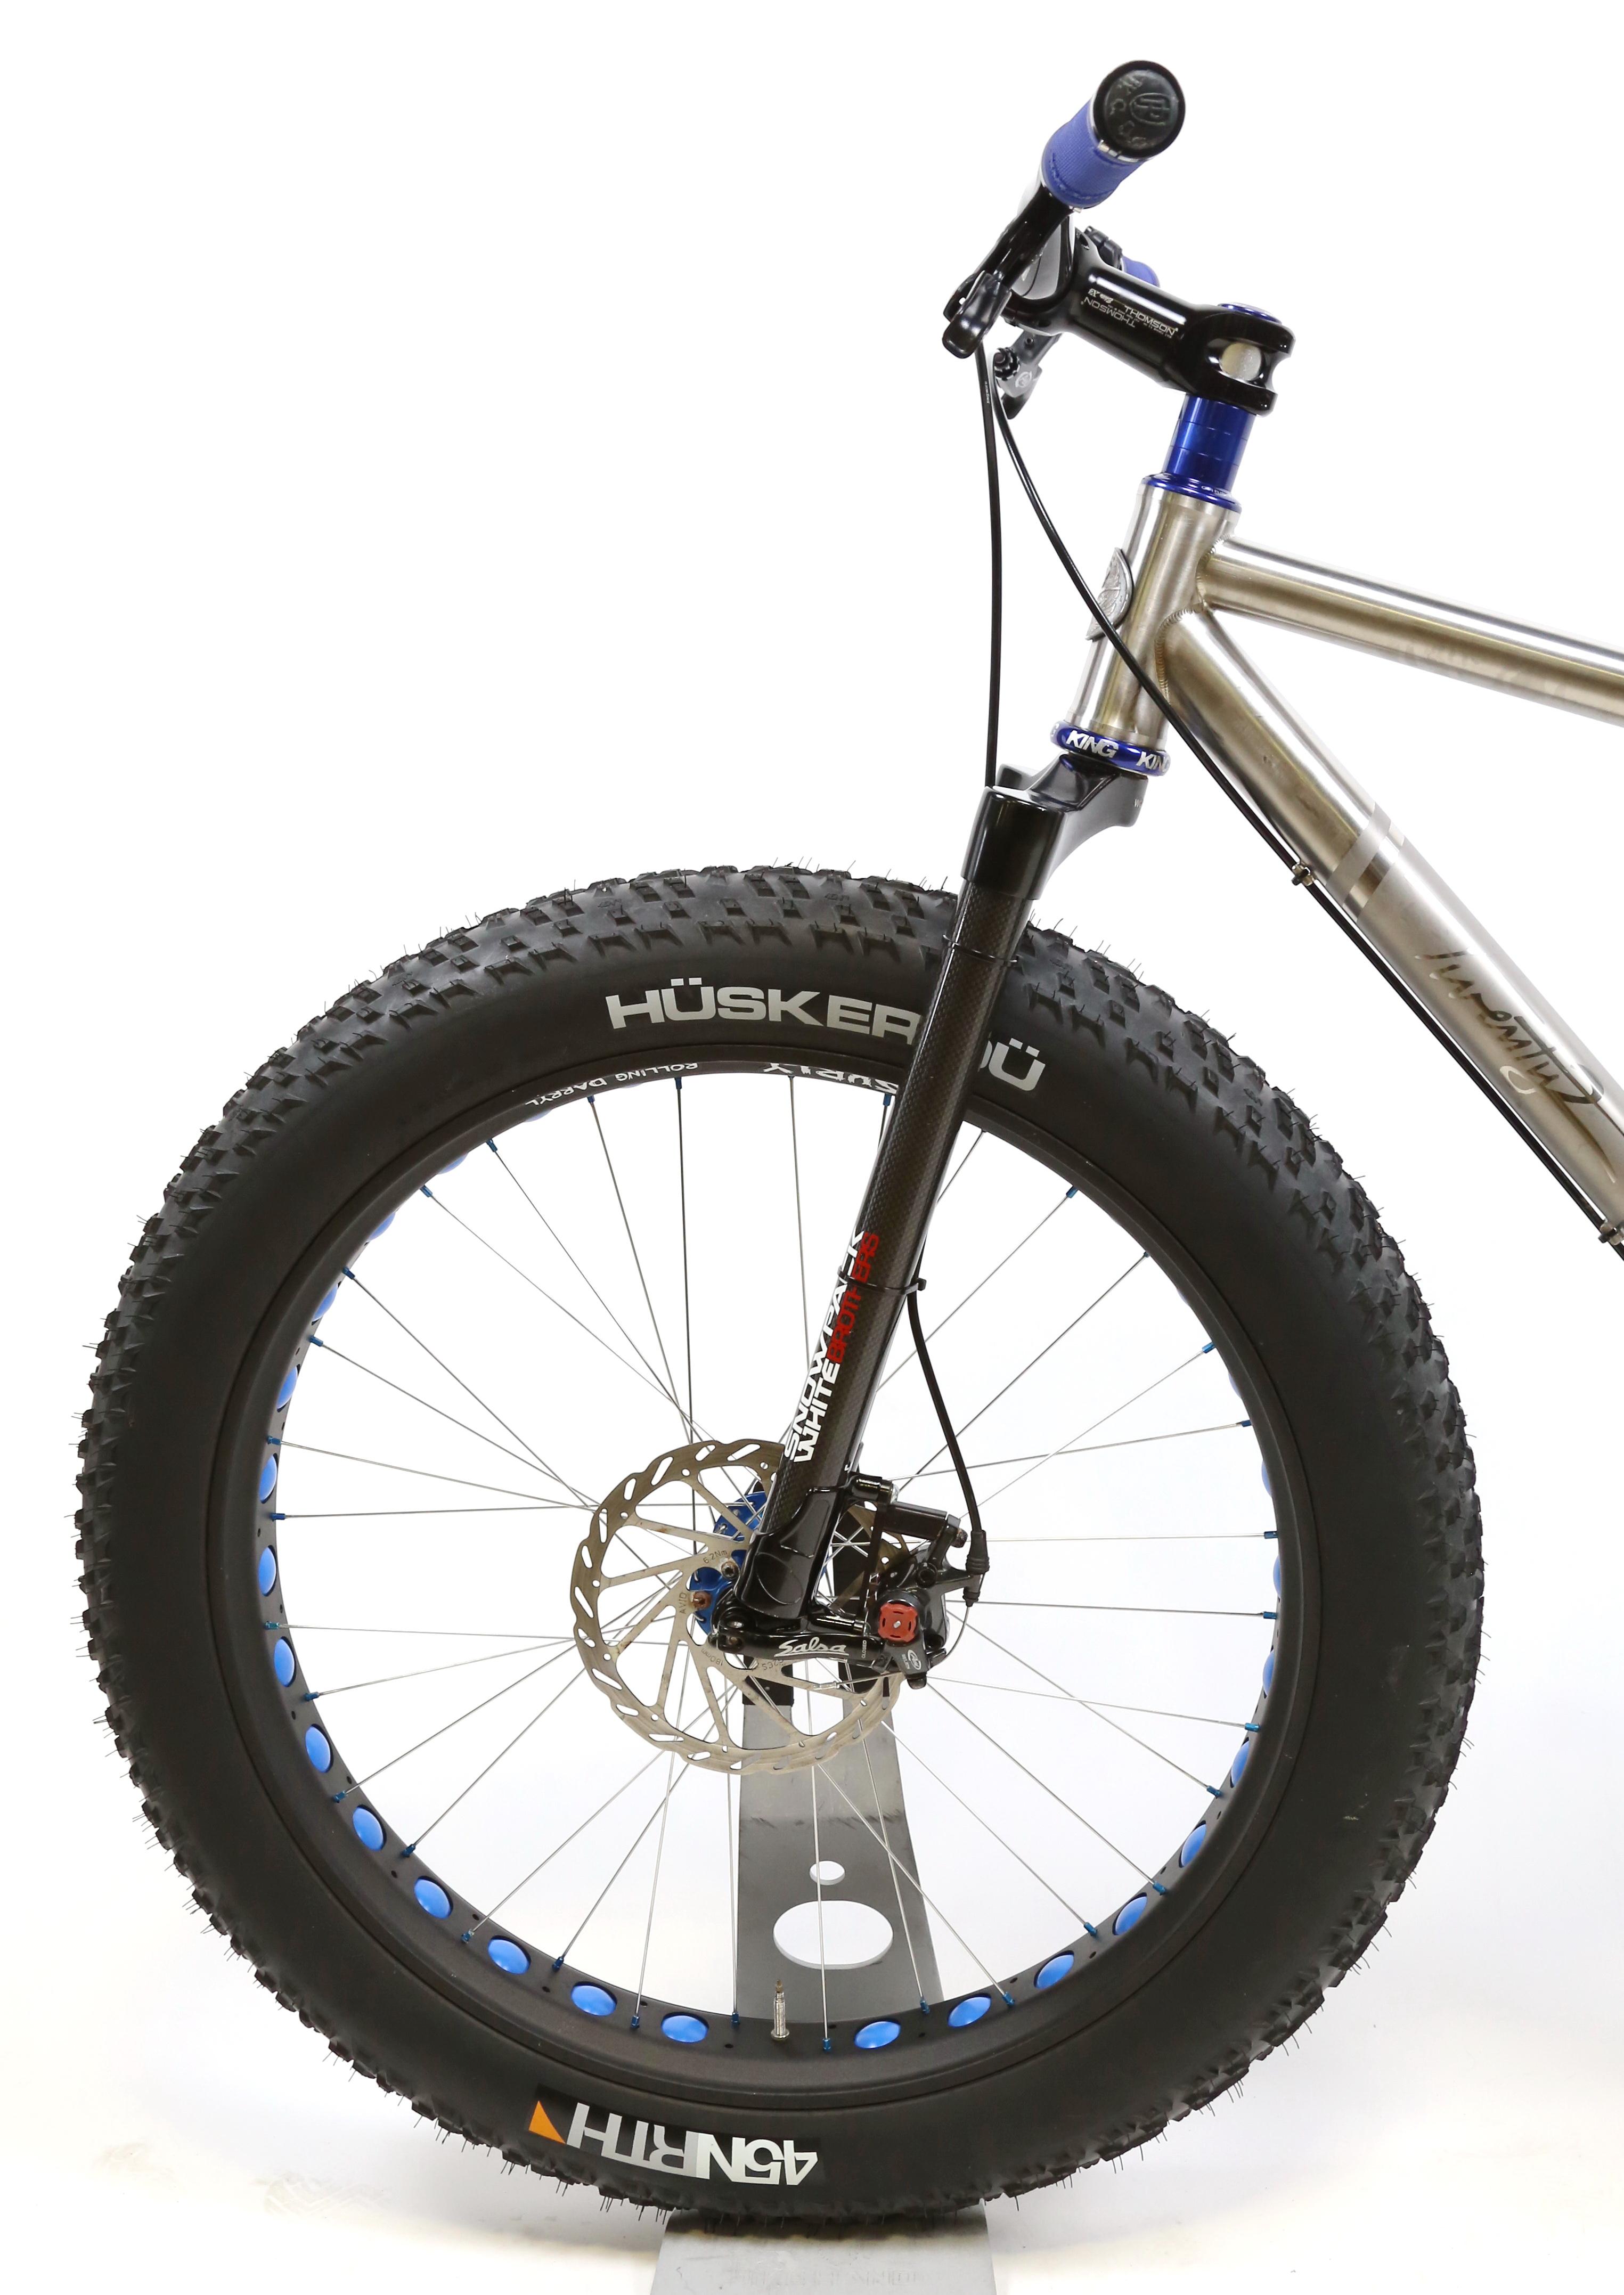 "P-1184 Bicycle tire Bike tire Fenix Cycles Tire Wanda 26/"" x 2.125/"" Beach C..."